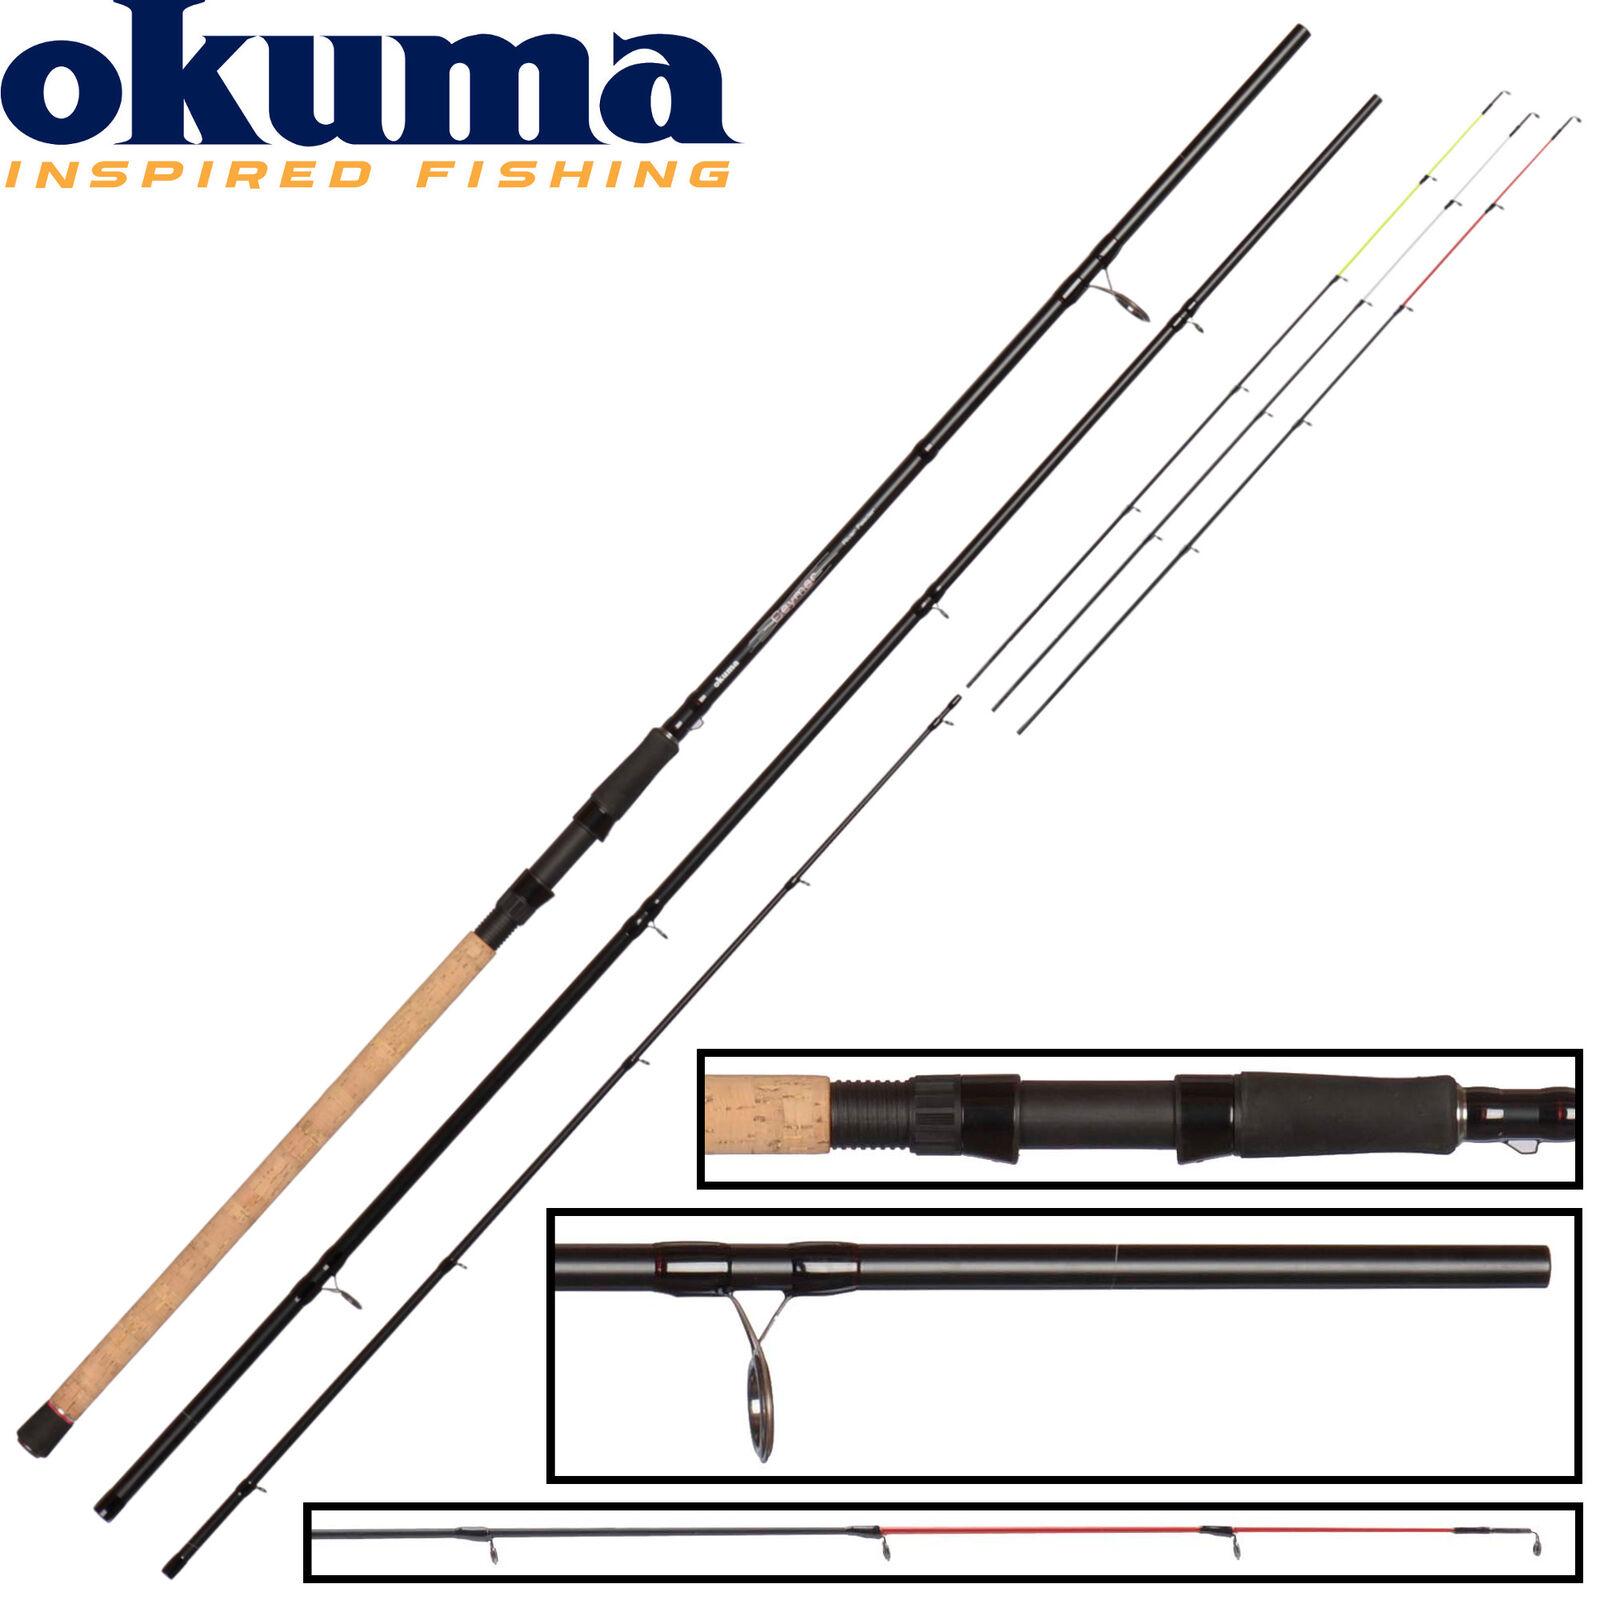 Okuma Ceymar Feeder 3,90m 40-80g Feederrute, Grundrute, Friedfischrute